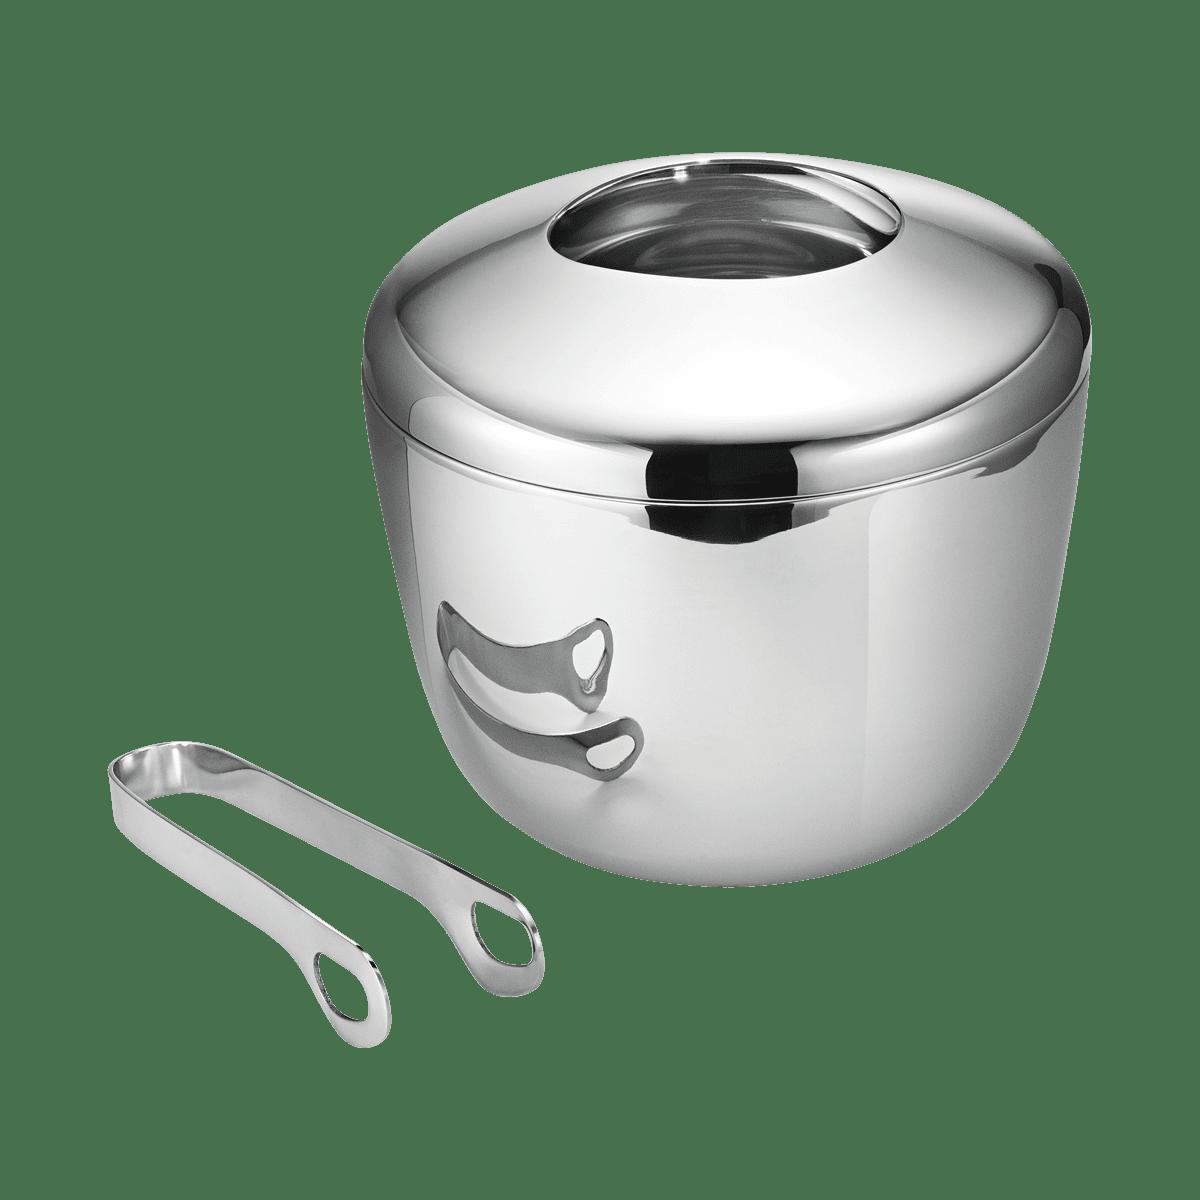 Georg Jensen SKY Ice Bucket